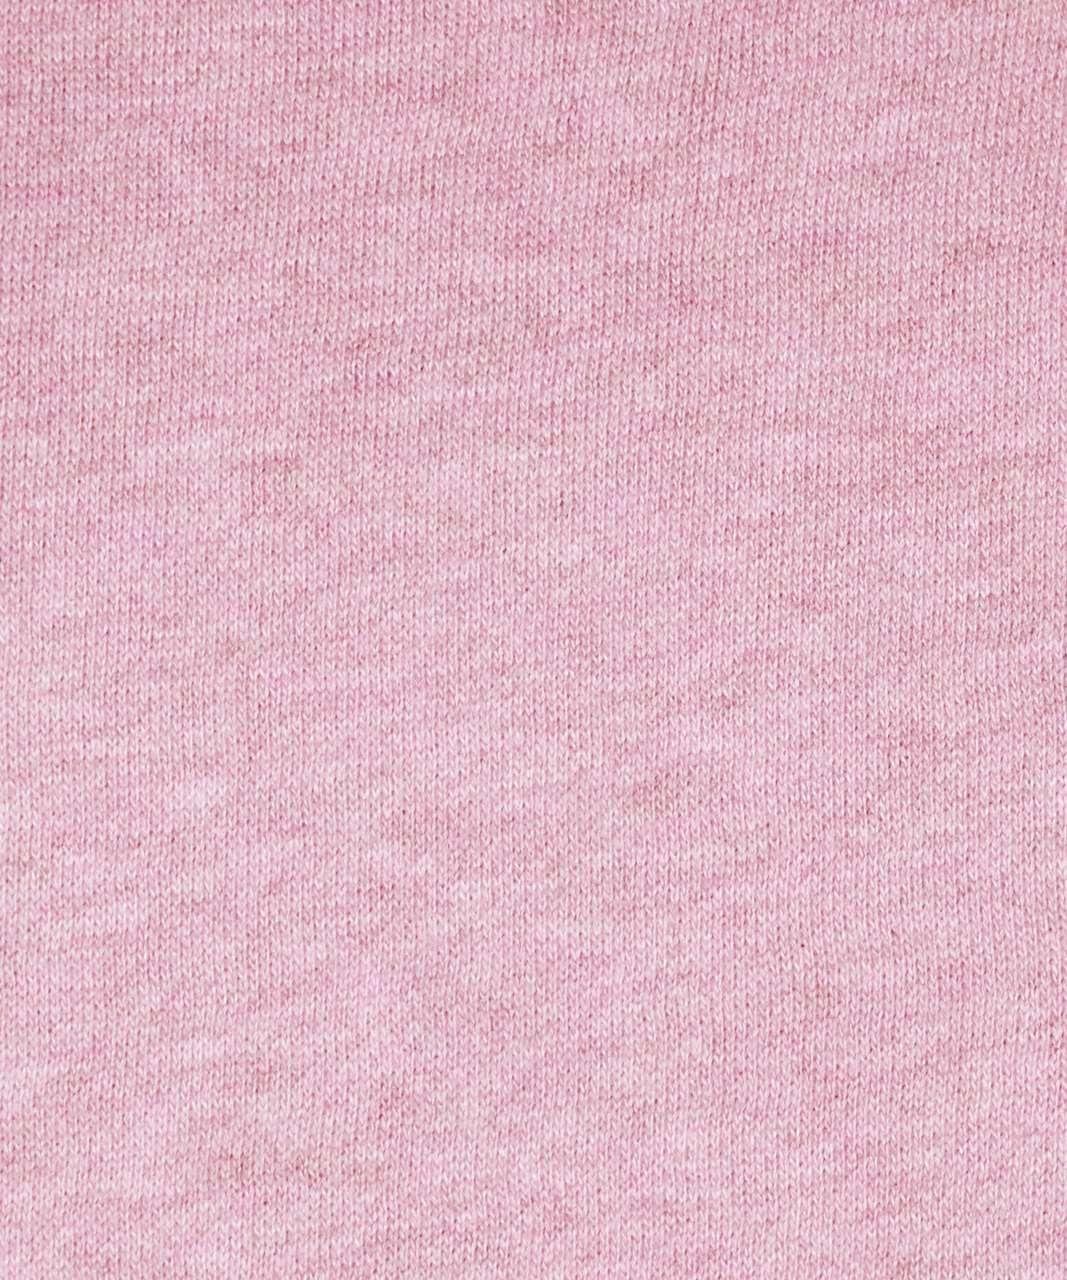 Lululemon Scuba Hoodie *Light Cotton Fleece - Heathered Dusty Rose